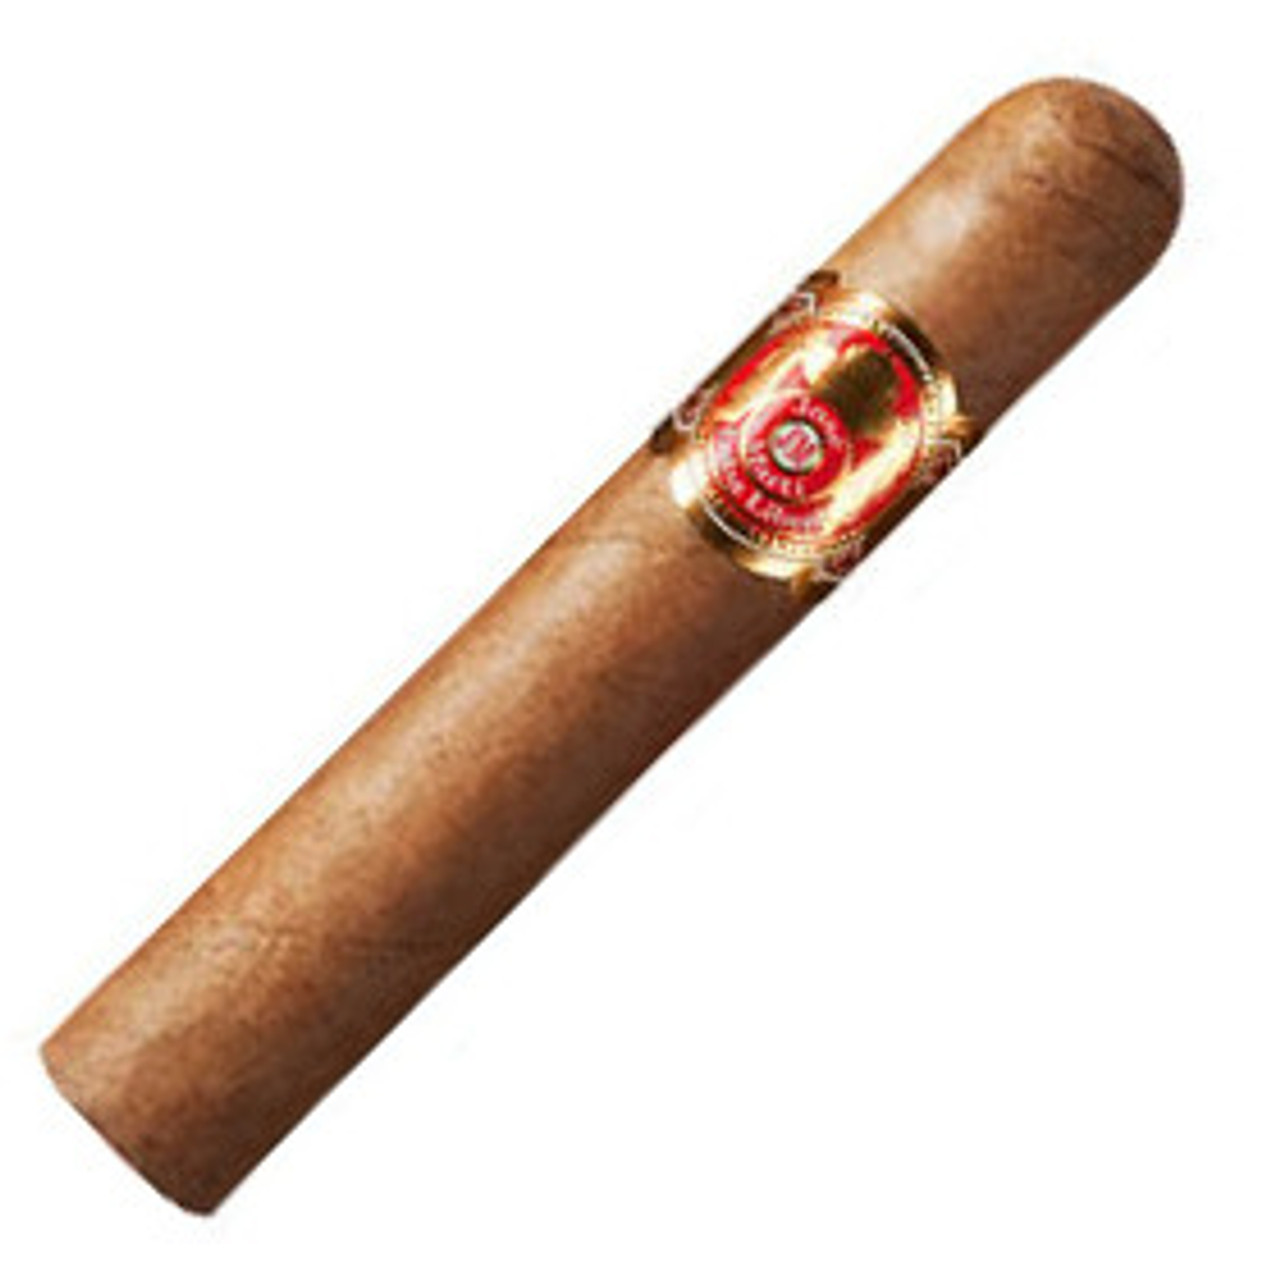 Jose Marti Dominican Rothschild Cigars - 4.5 x 50 (Bundle of 10)